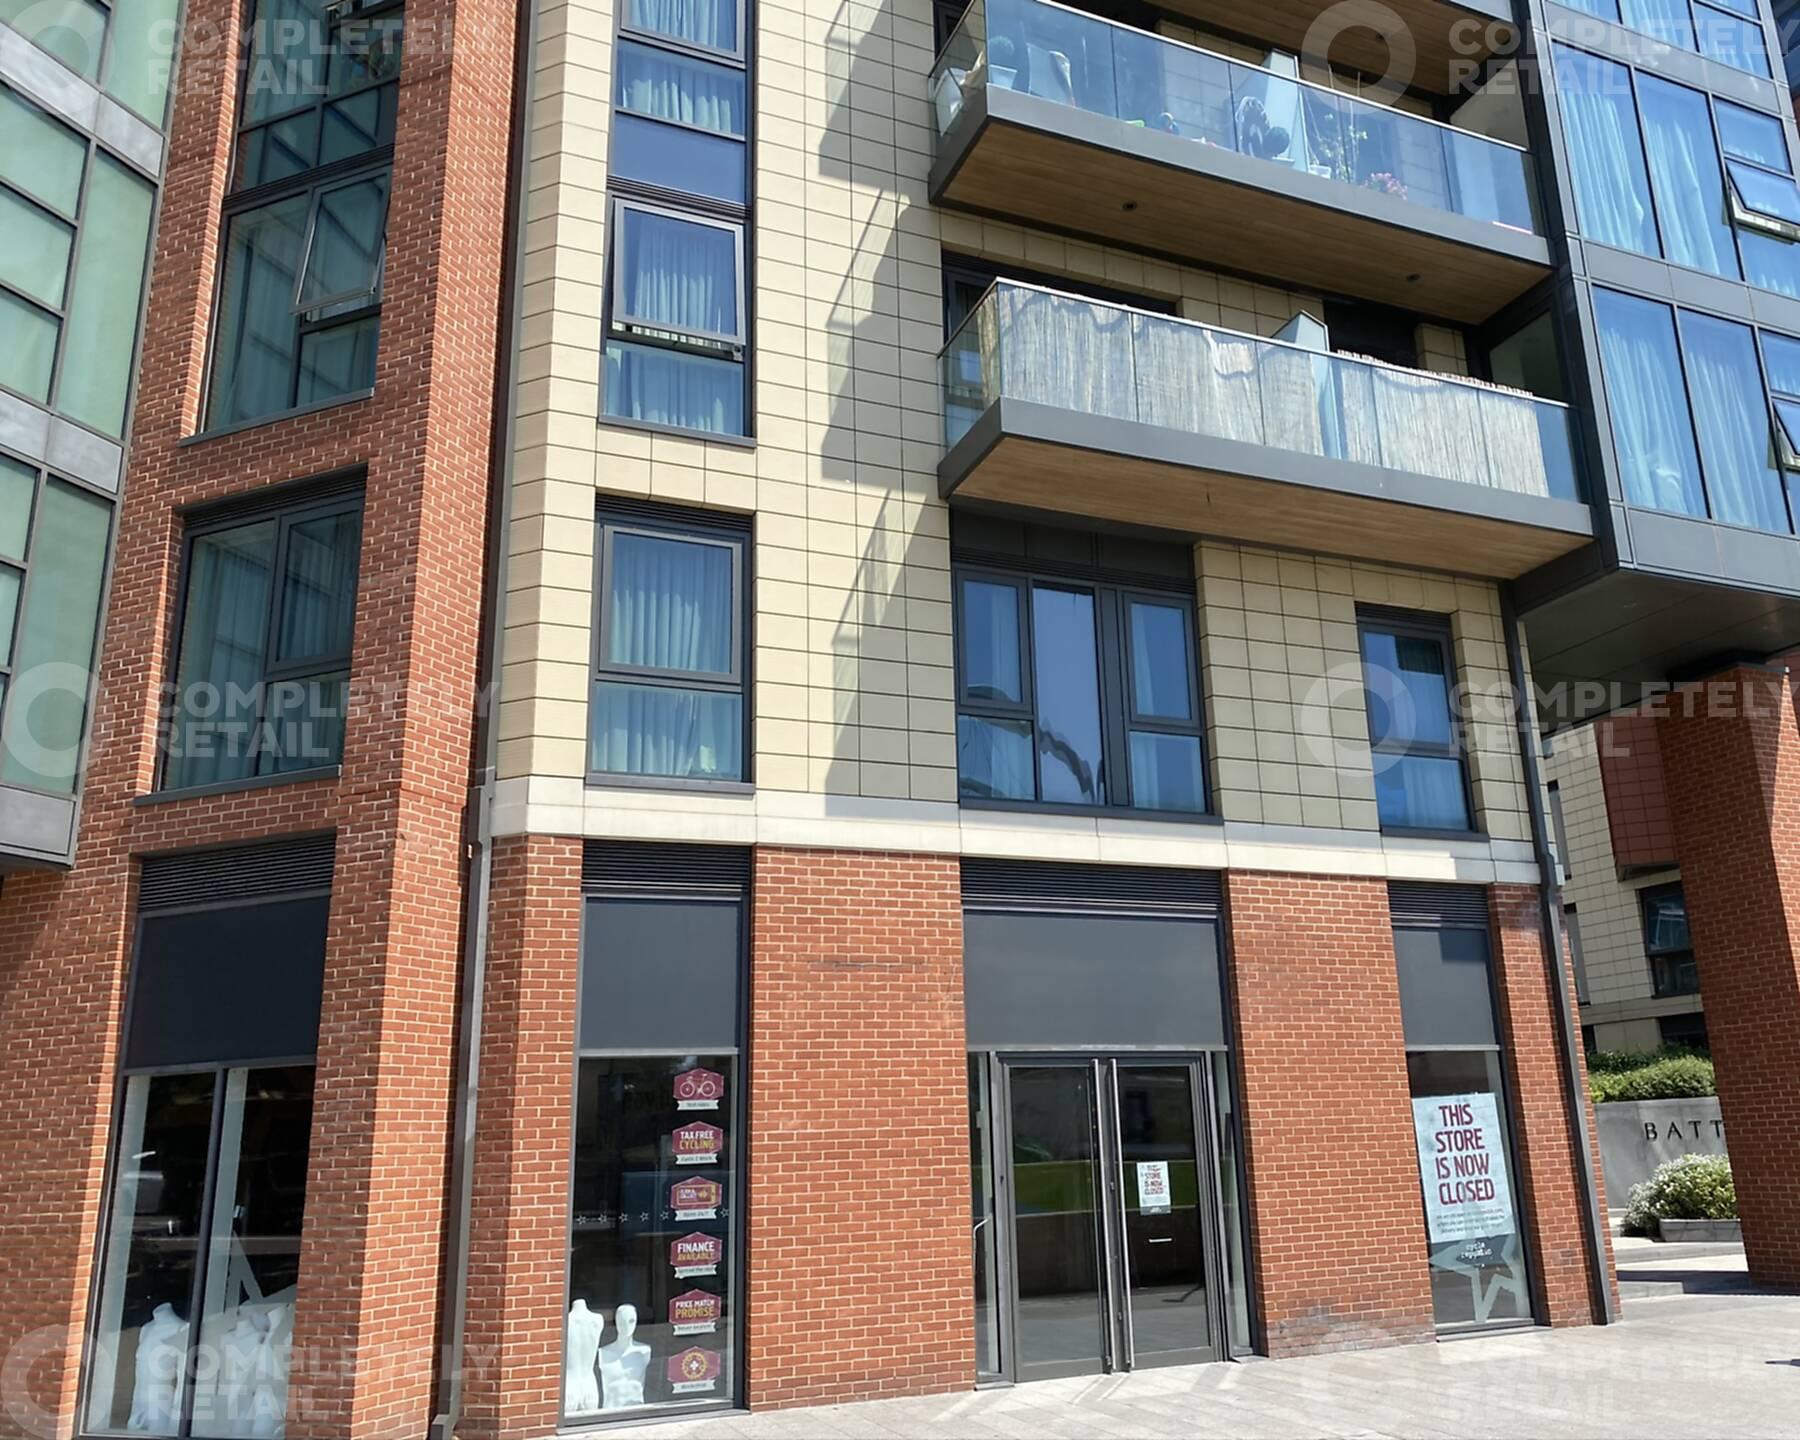 Units 32 & 33, Block Q, Quarter House, Battersea Reach